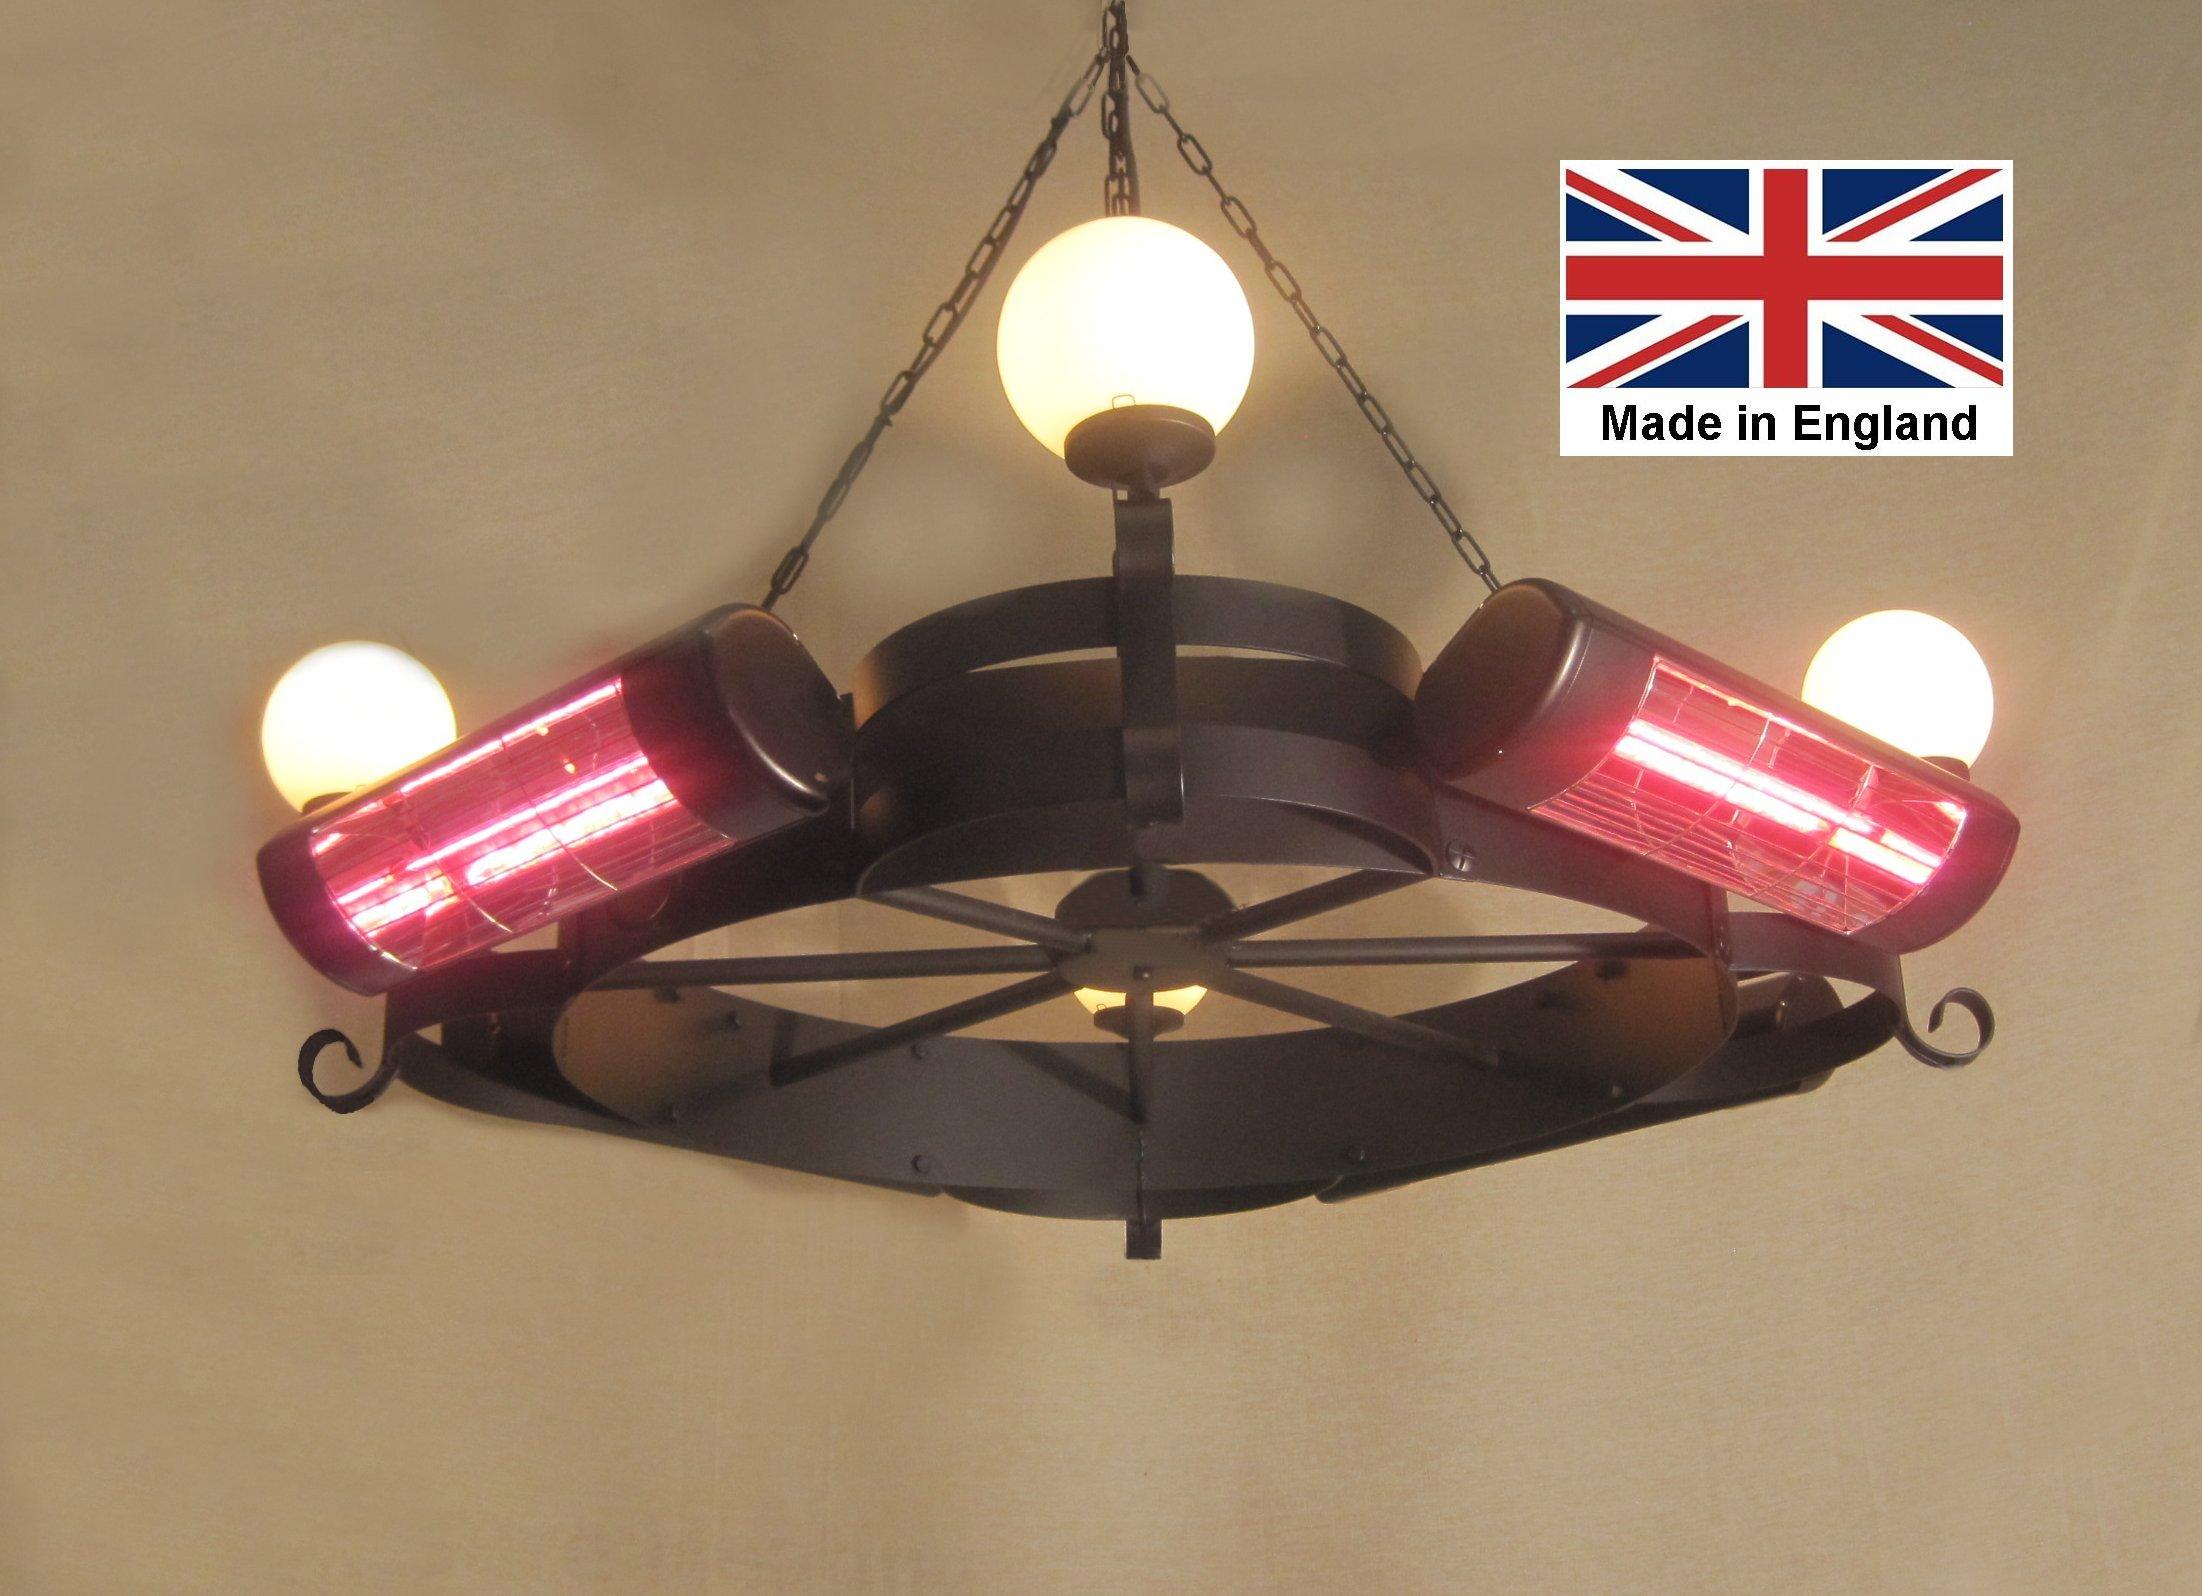 Chandelier Heater 6kW 'Willoughby' Design